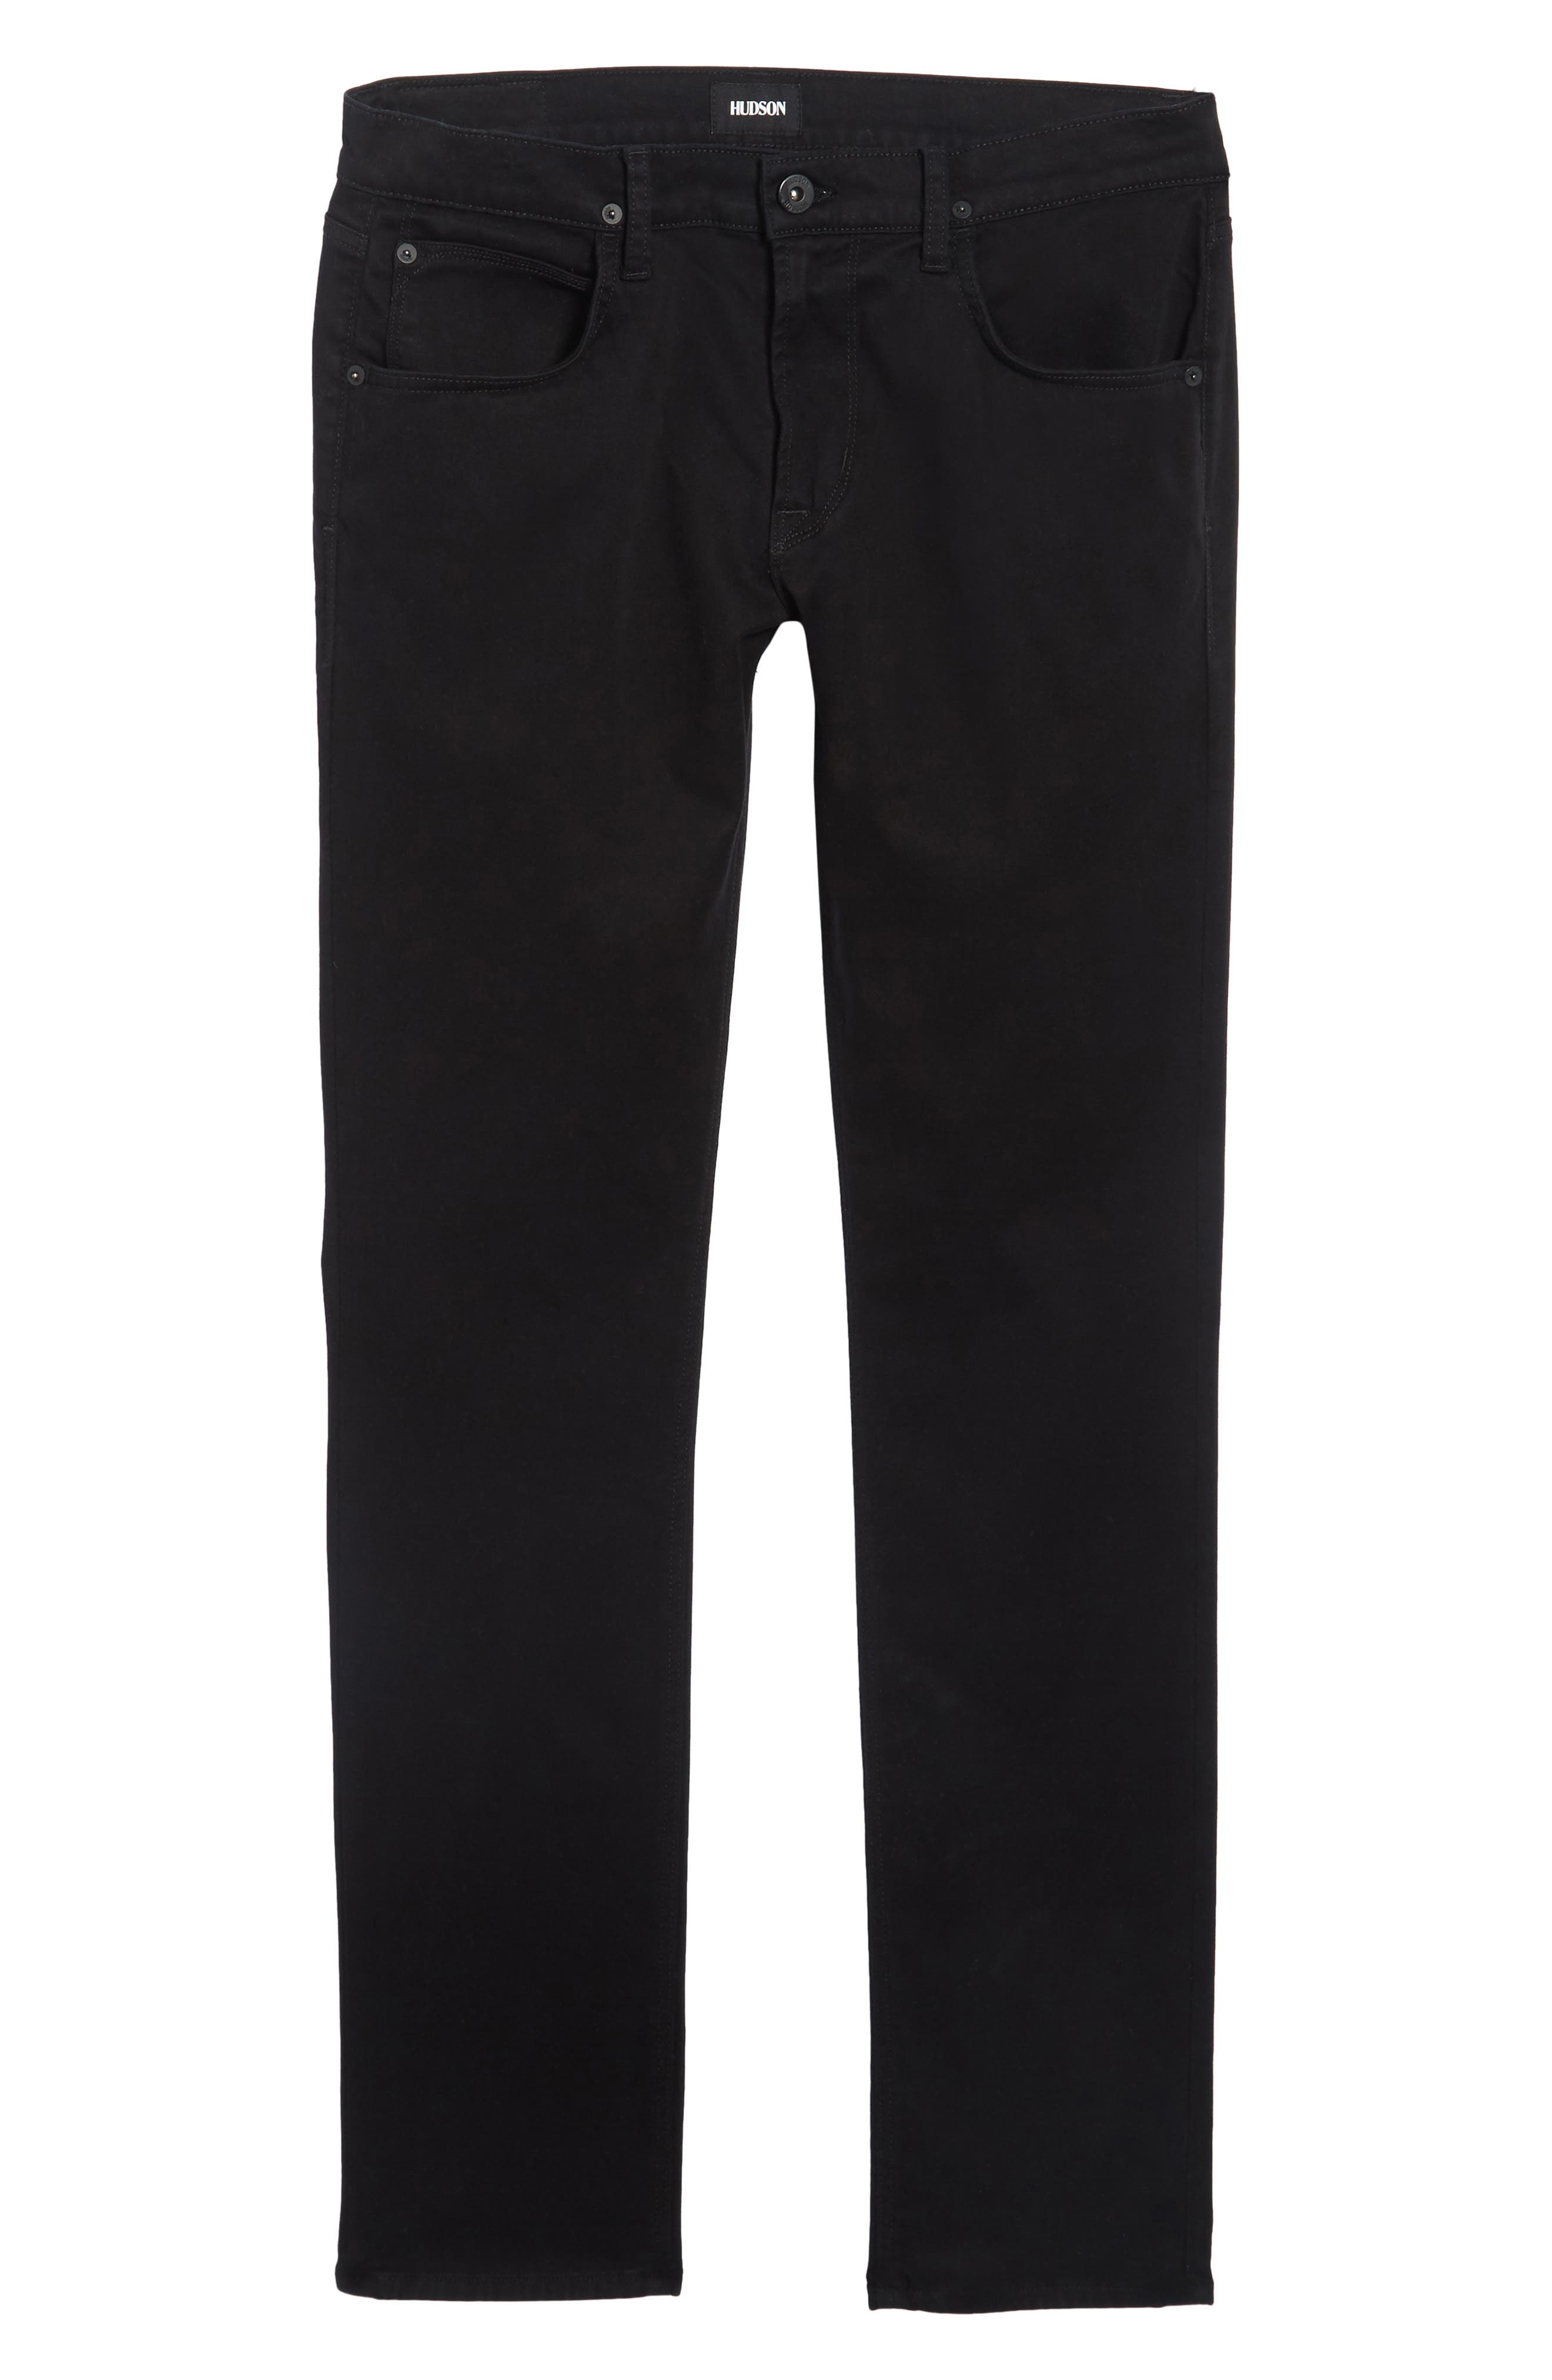 Blake Slim Fit Jeans,                             Alternate thumbnail 7, color,                             Blackened